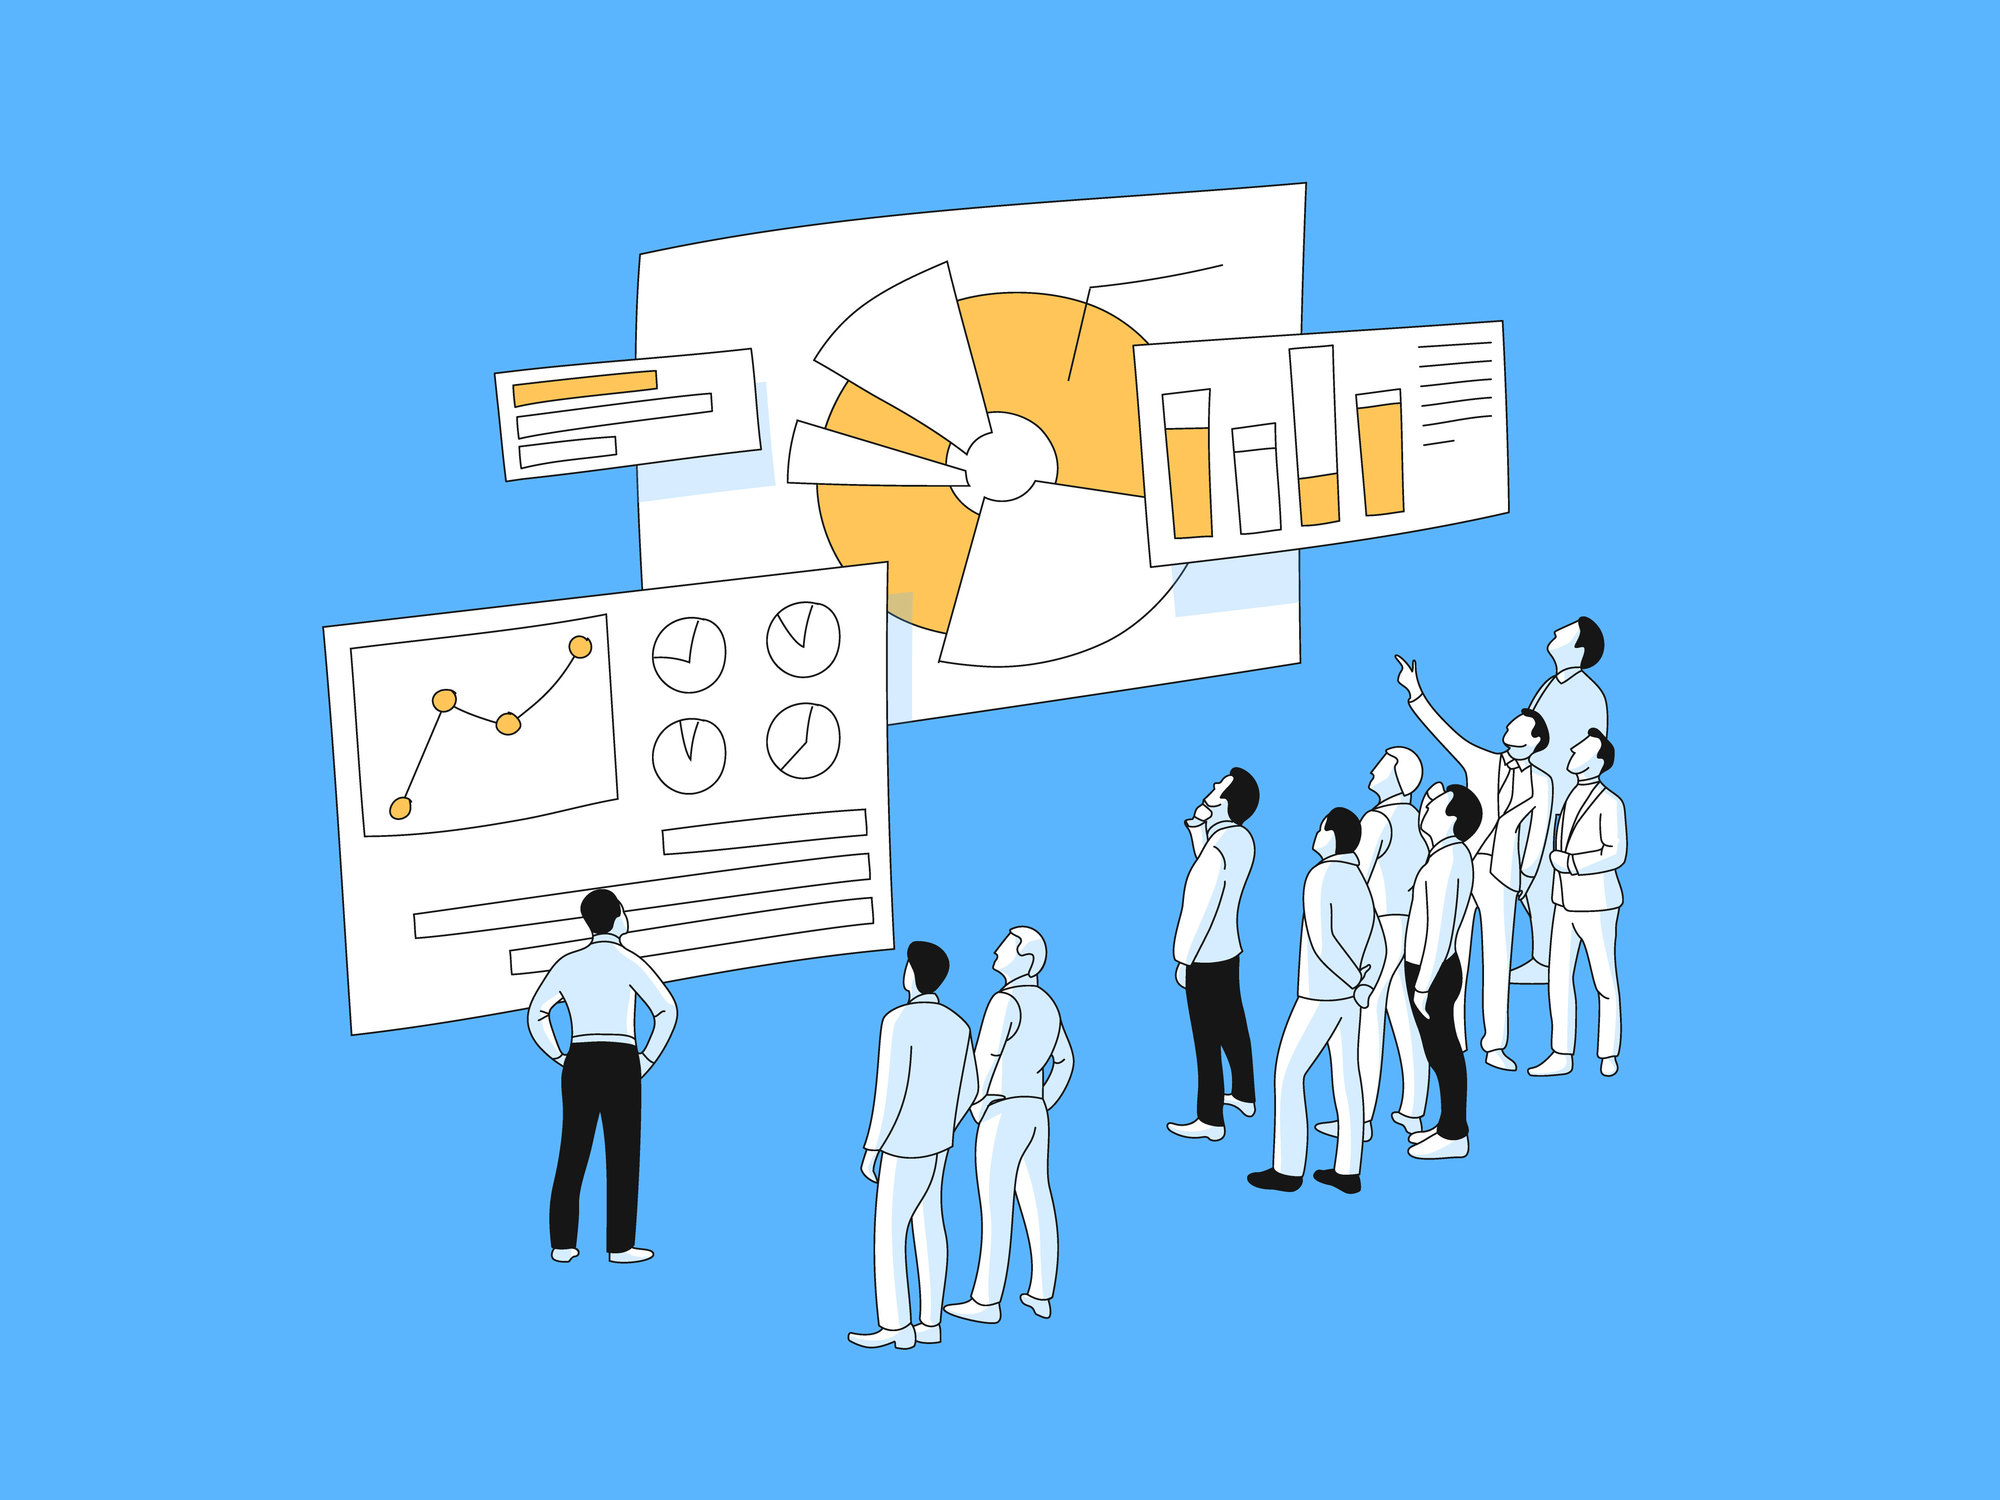 「SPSS早わかり」統計からビッグデータ分析まで。様々なシーンで使える分析環境(その2):Modeler Server編